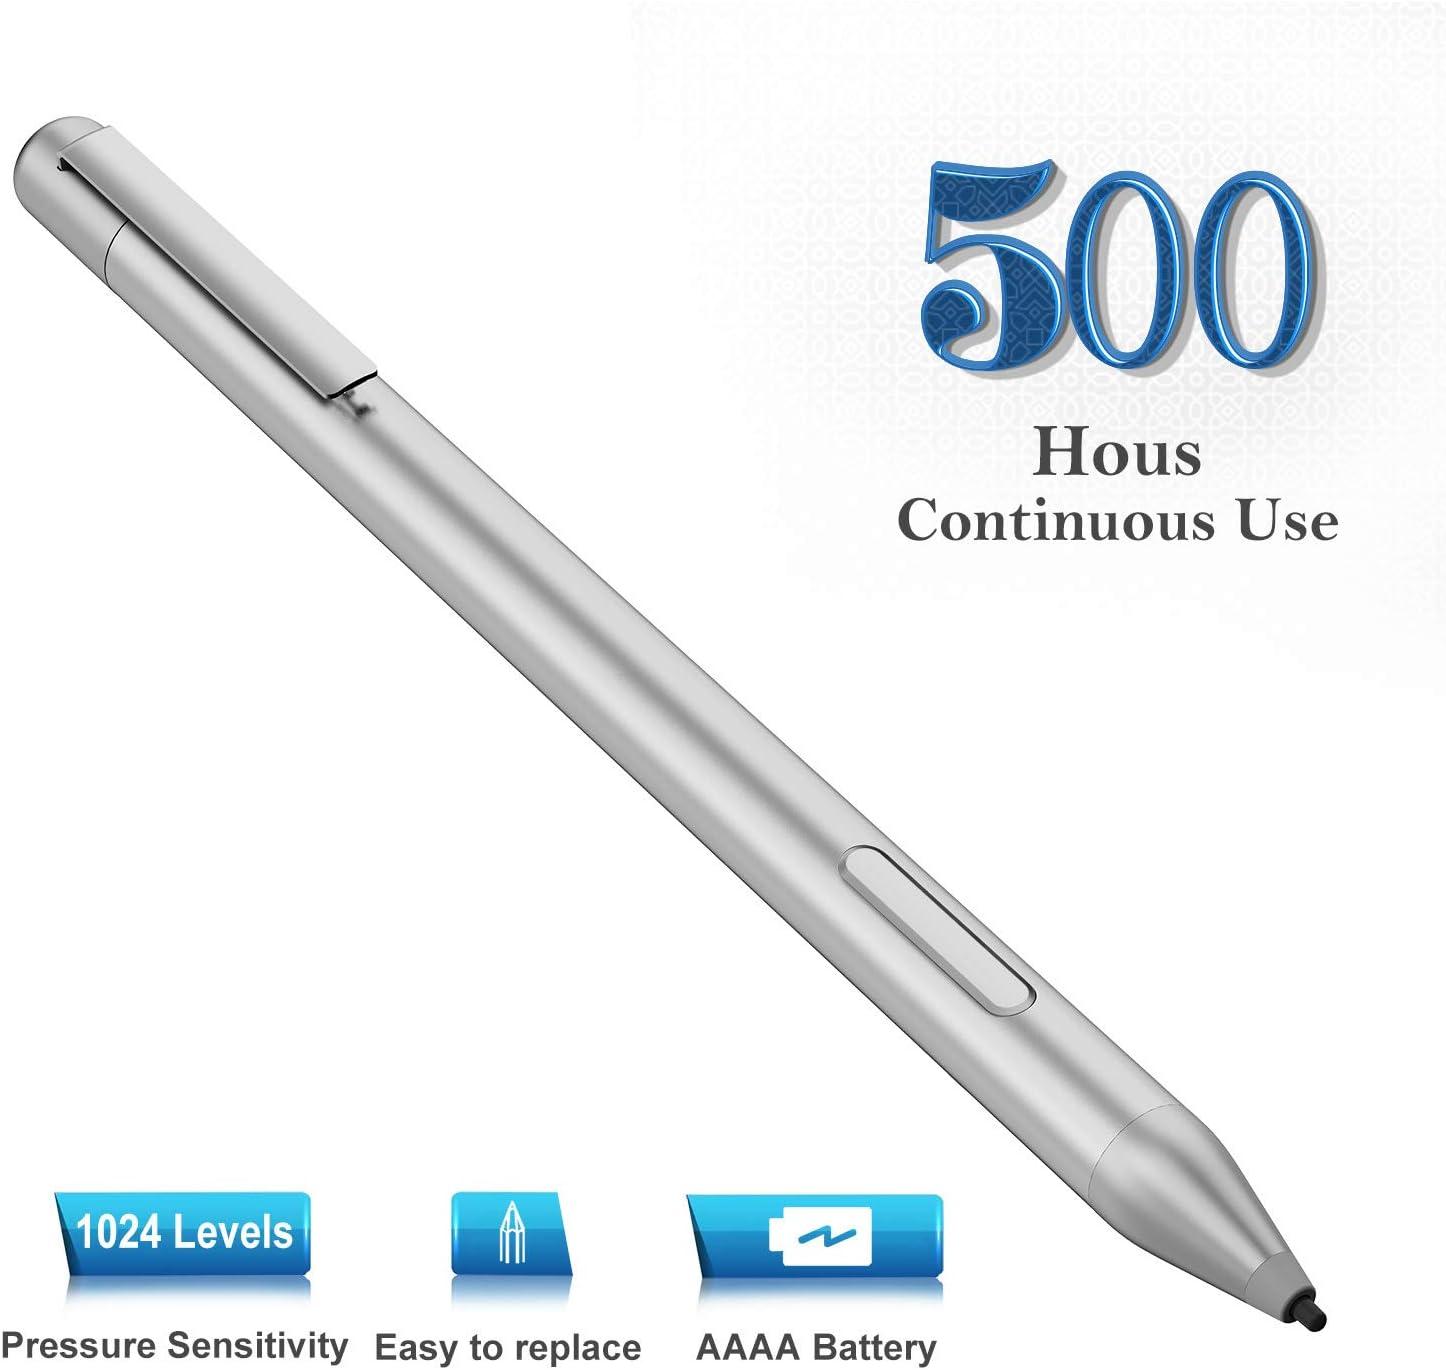 Stylus Digital Pen for HP Chromebook x360 11G1;Envy x360 13-ag0 13z-ag0xxx 15-bp1 15-bq1 15-cn0 15-cn0xxx 15-cp0 15-bp0xx 15-bq0xx 15-bqxxxx 15M-BP012DX 15M-BP112DX 17-aexxx,1000 Hours Usage Times